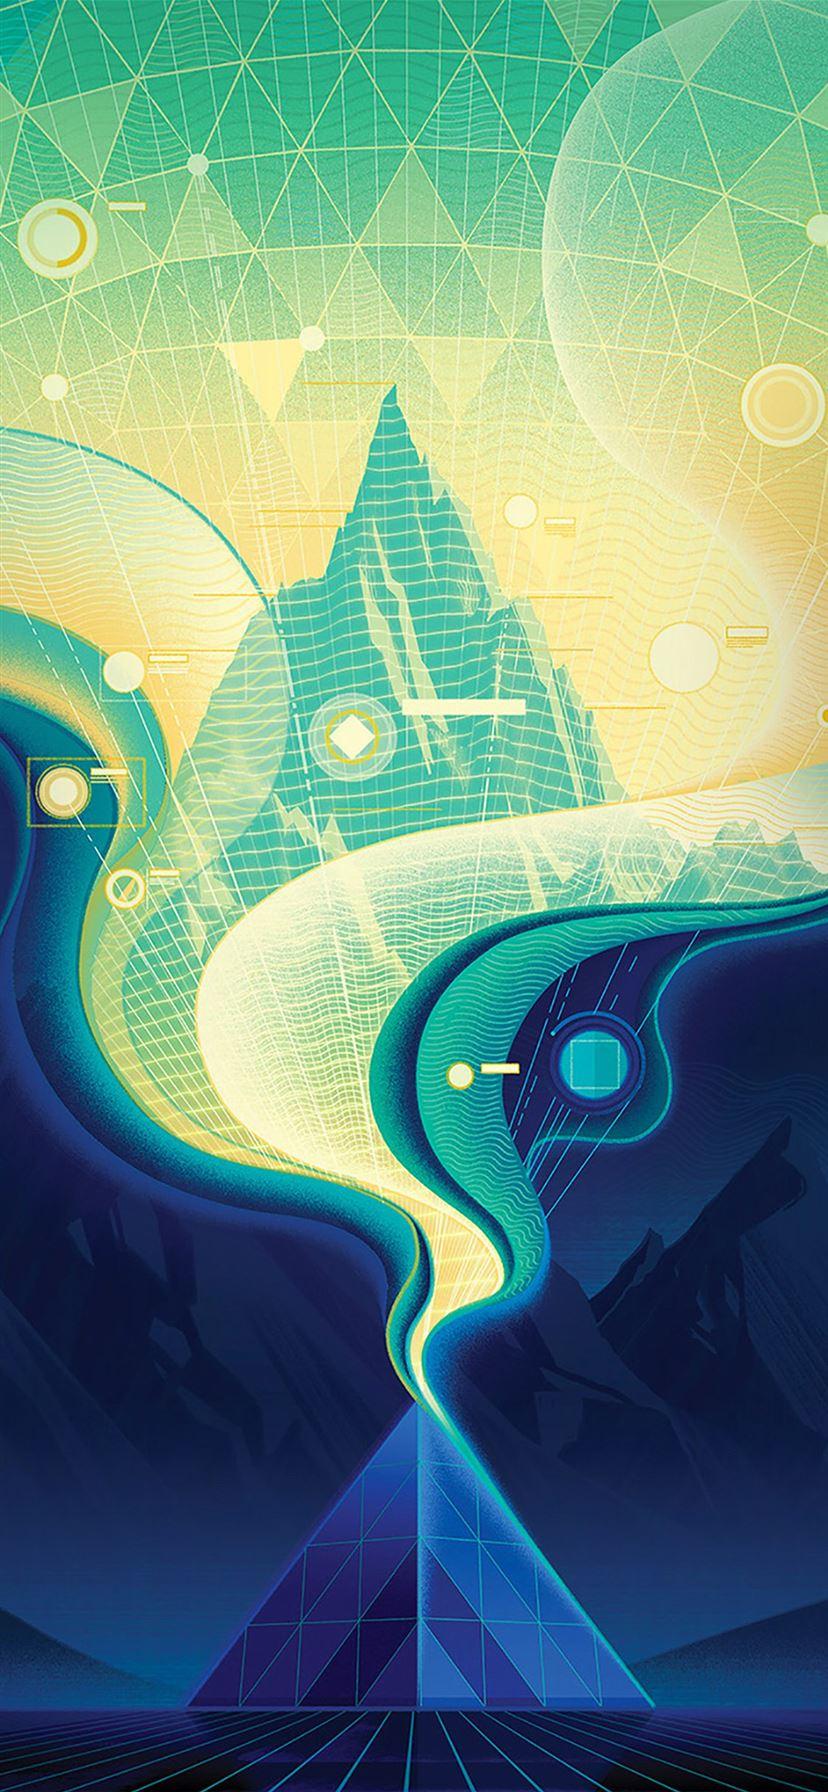 Digital abstract road blue illustration art iPhone X ...